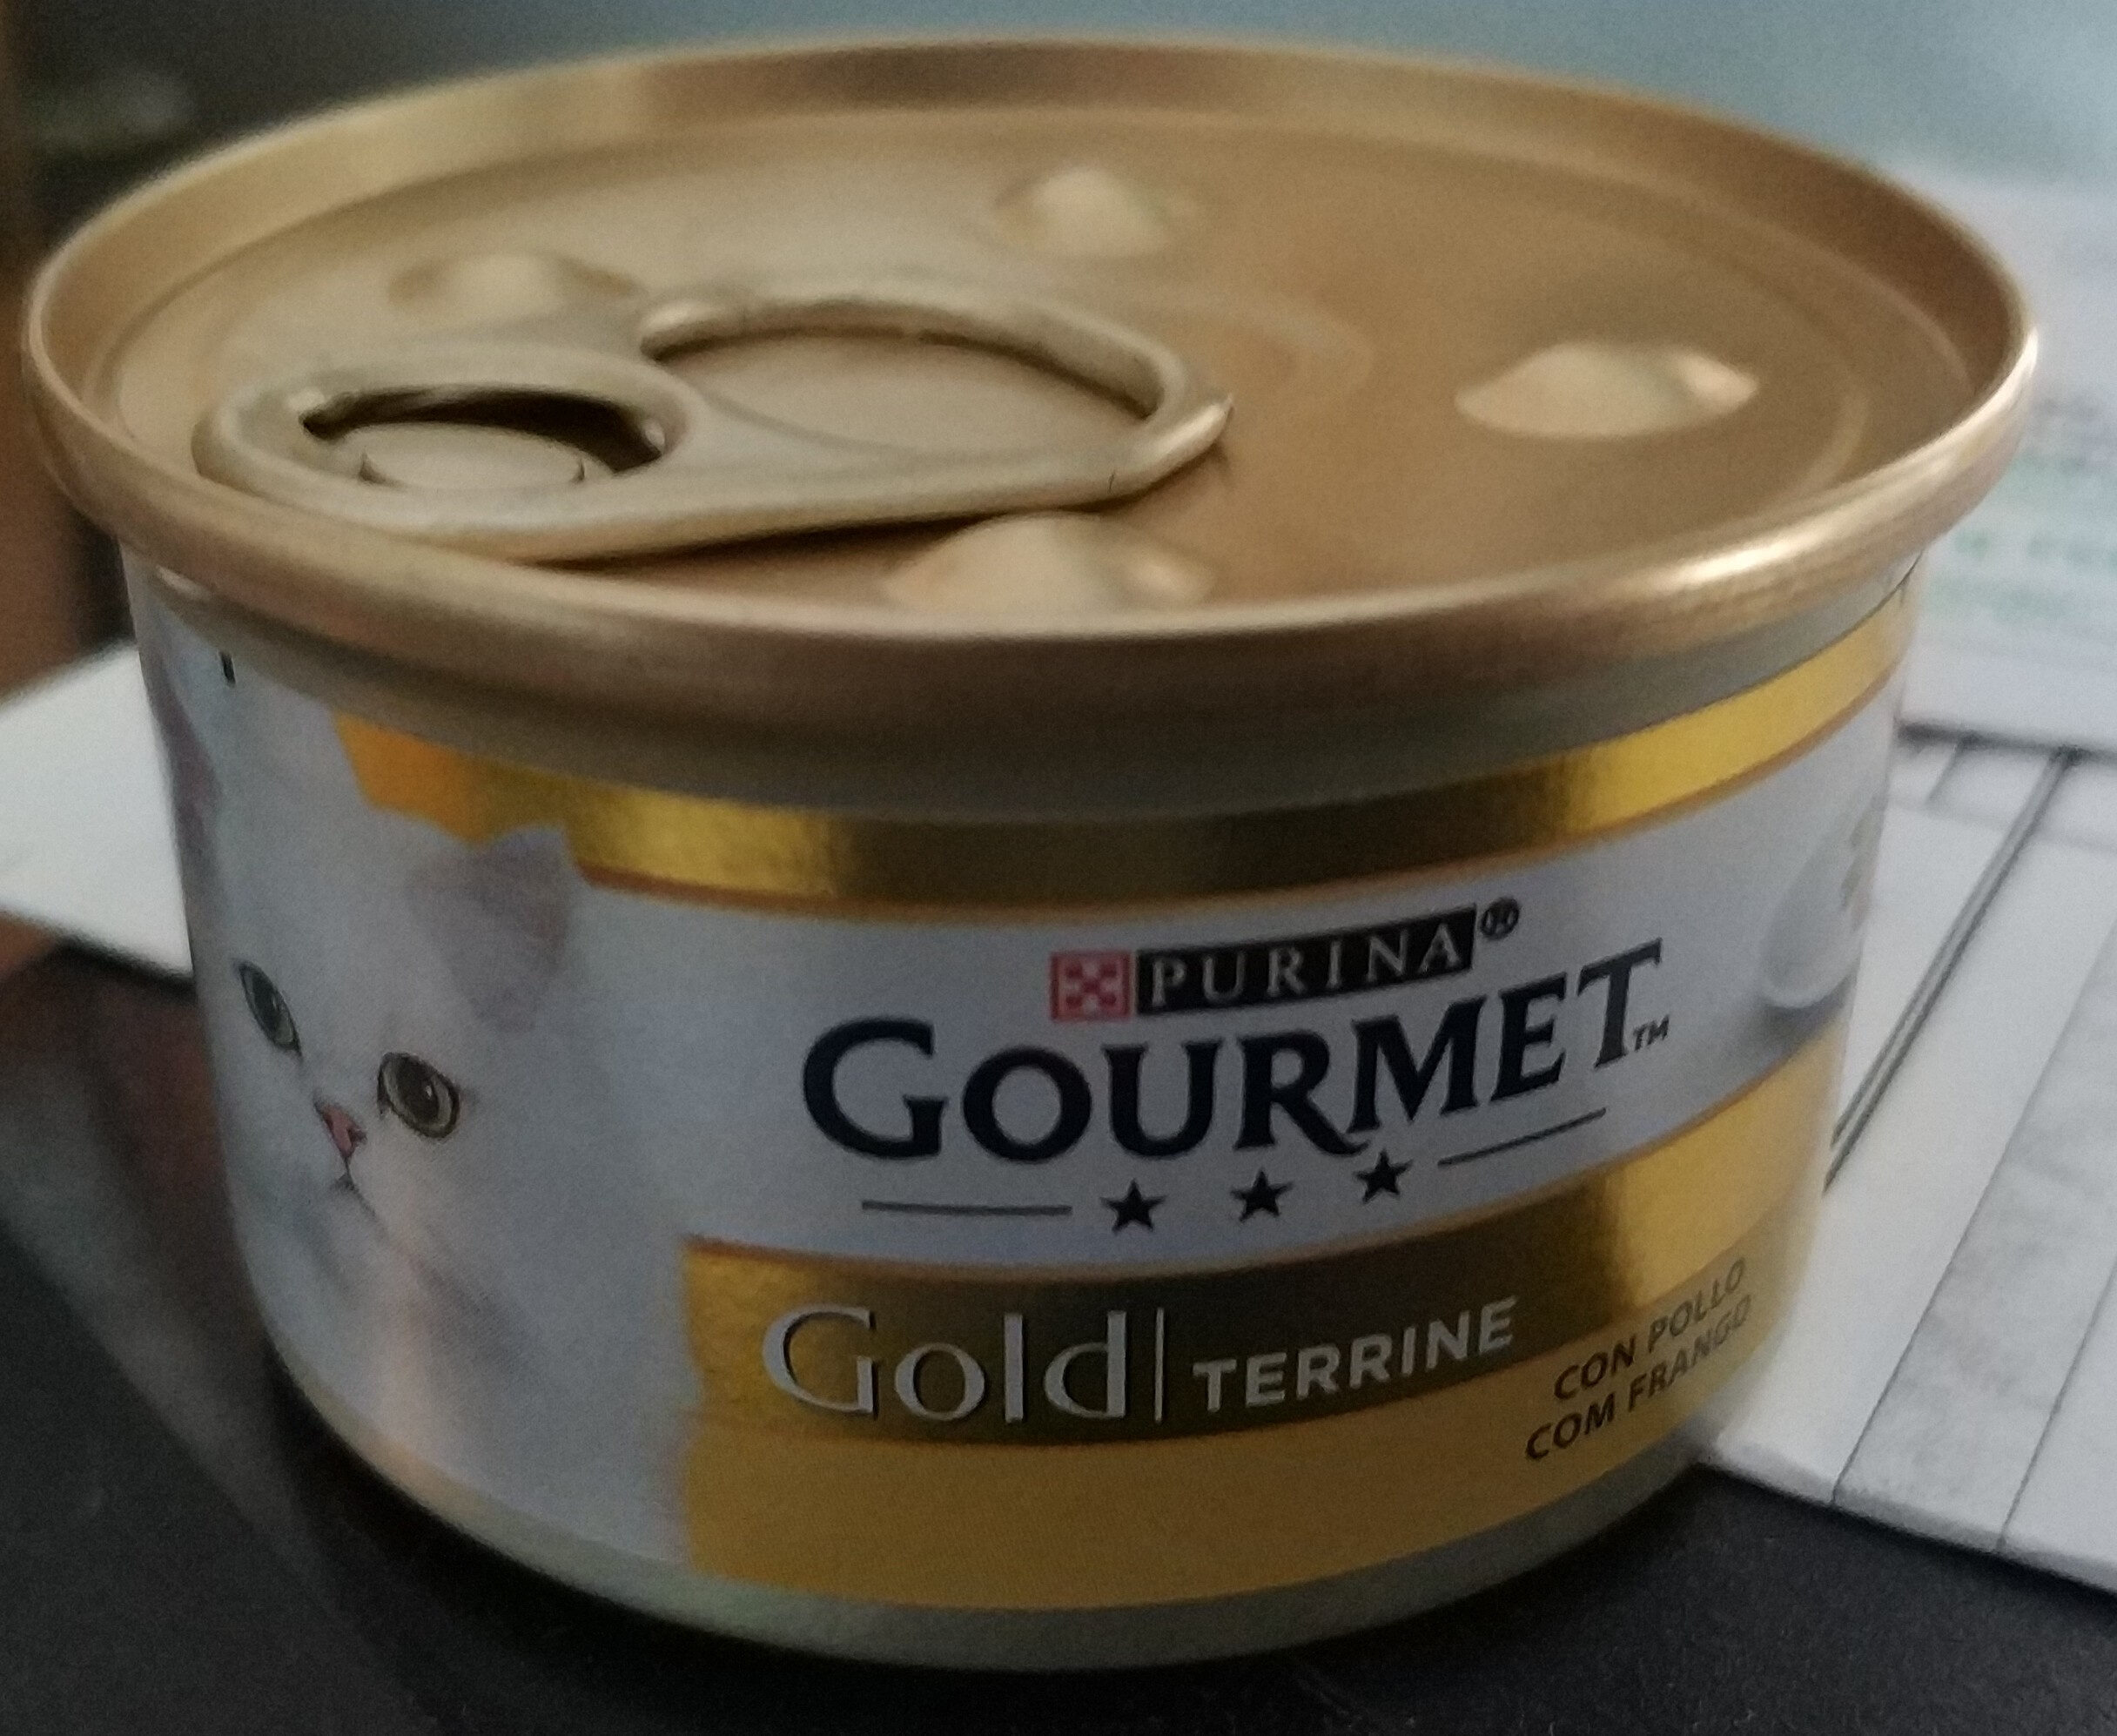 Gourmet gold terrine - Product - es